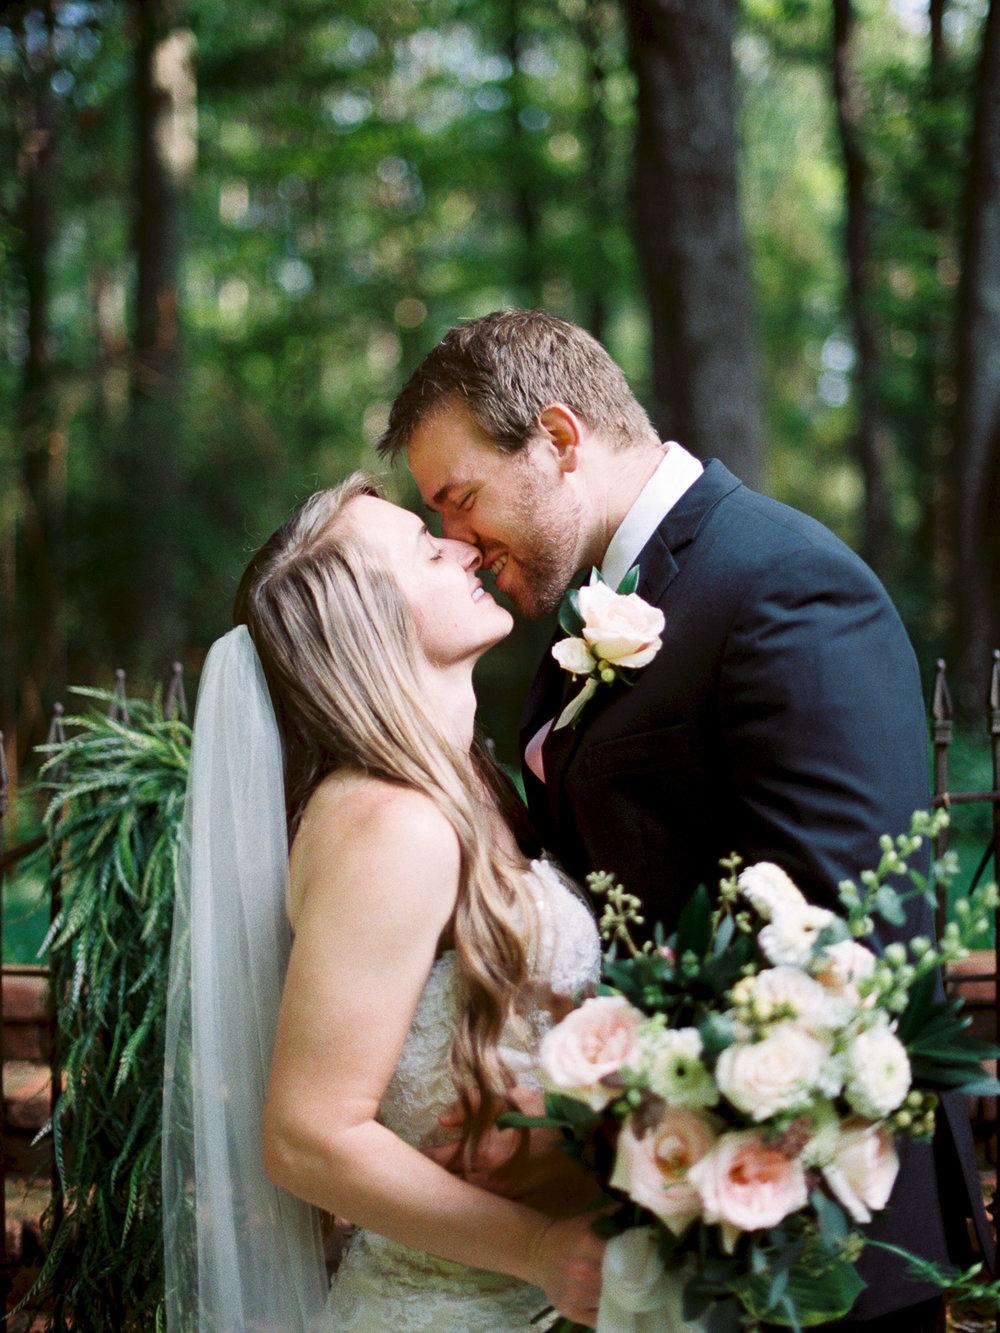 christinadavisphotography-romanticwedding-gardenweddinginspiration38.jpg